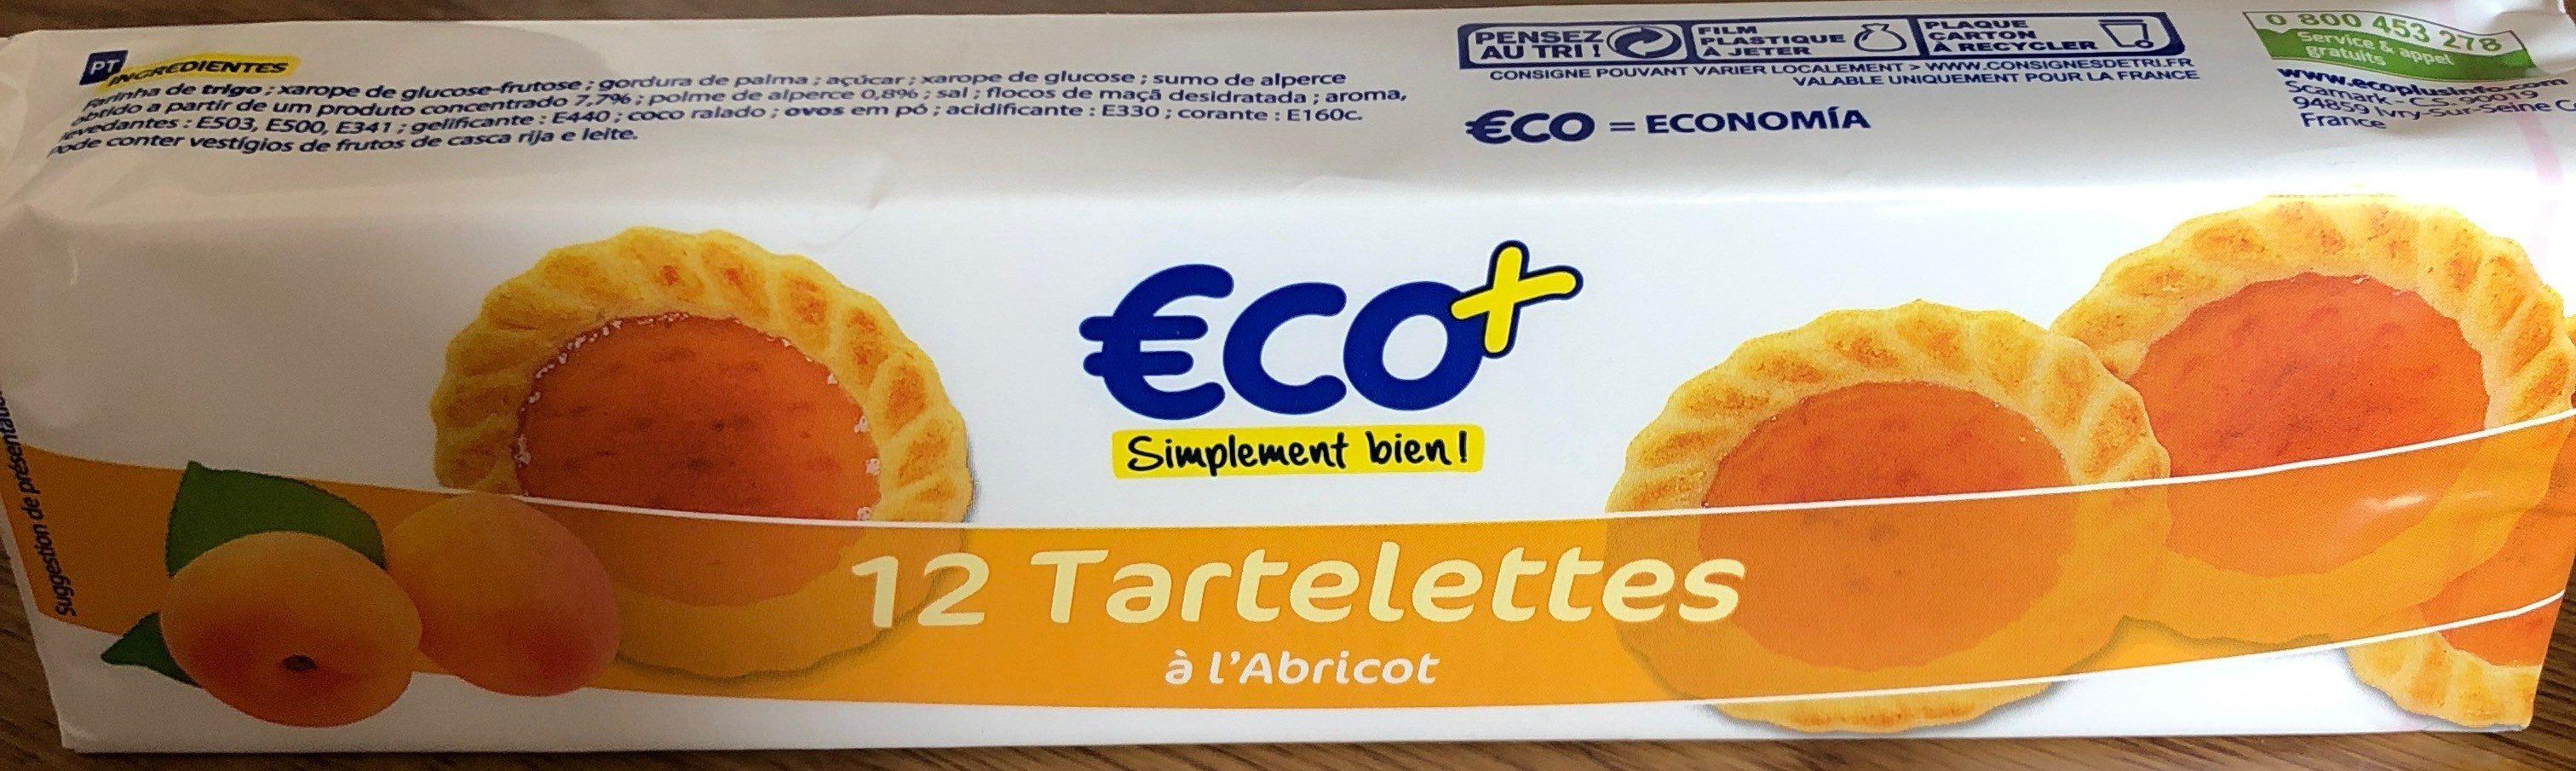 TARTELETTES ABRICOT ECO+ 200G - Product - fr